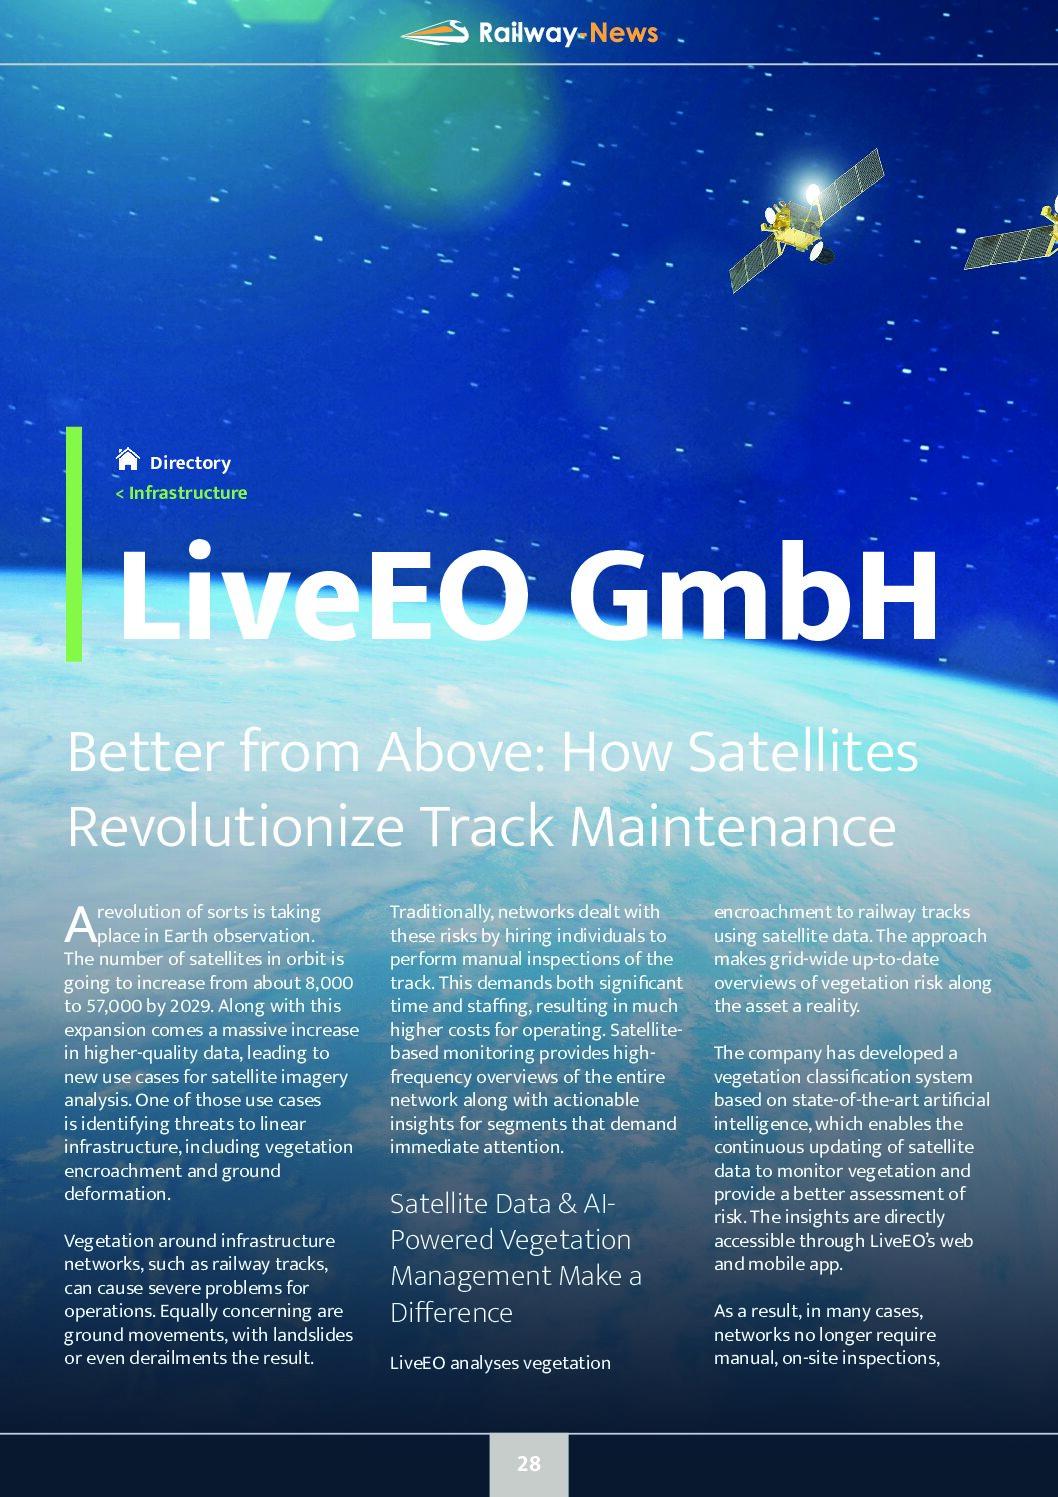 Better from Above: How Satellites Revolutionize Track Maintenance